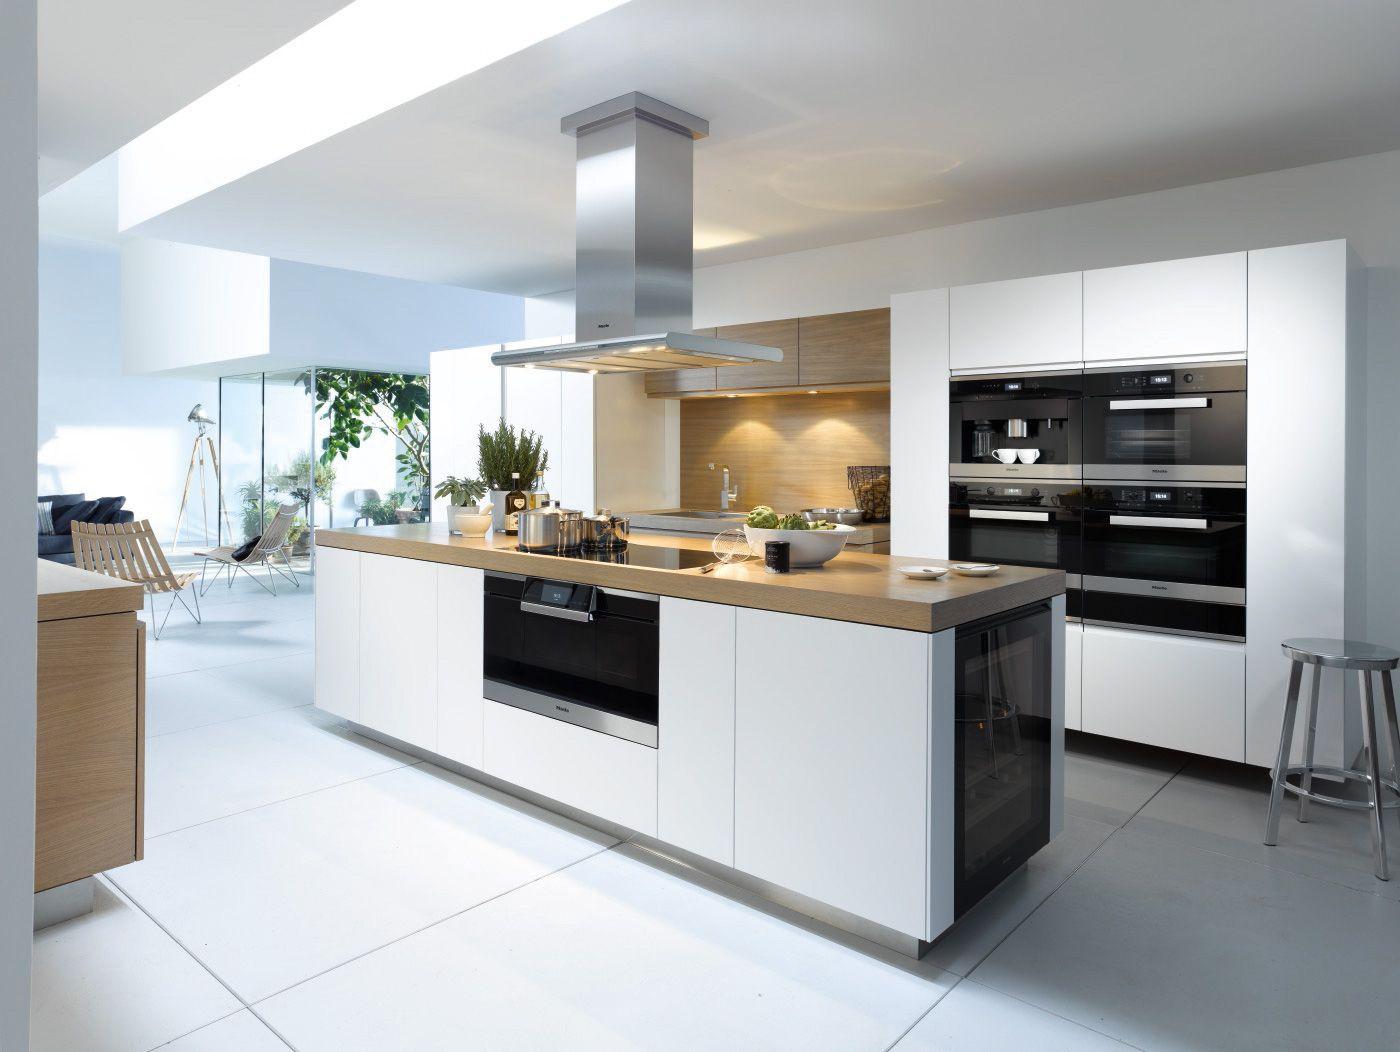 Home Design Keukens : Miele inspirience partner wildhagen design keukens. laat u